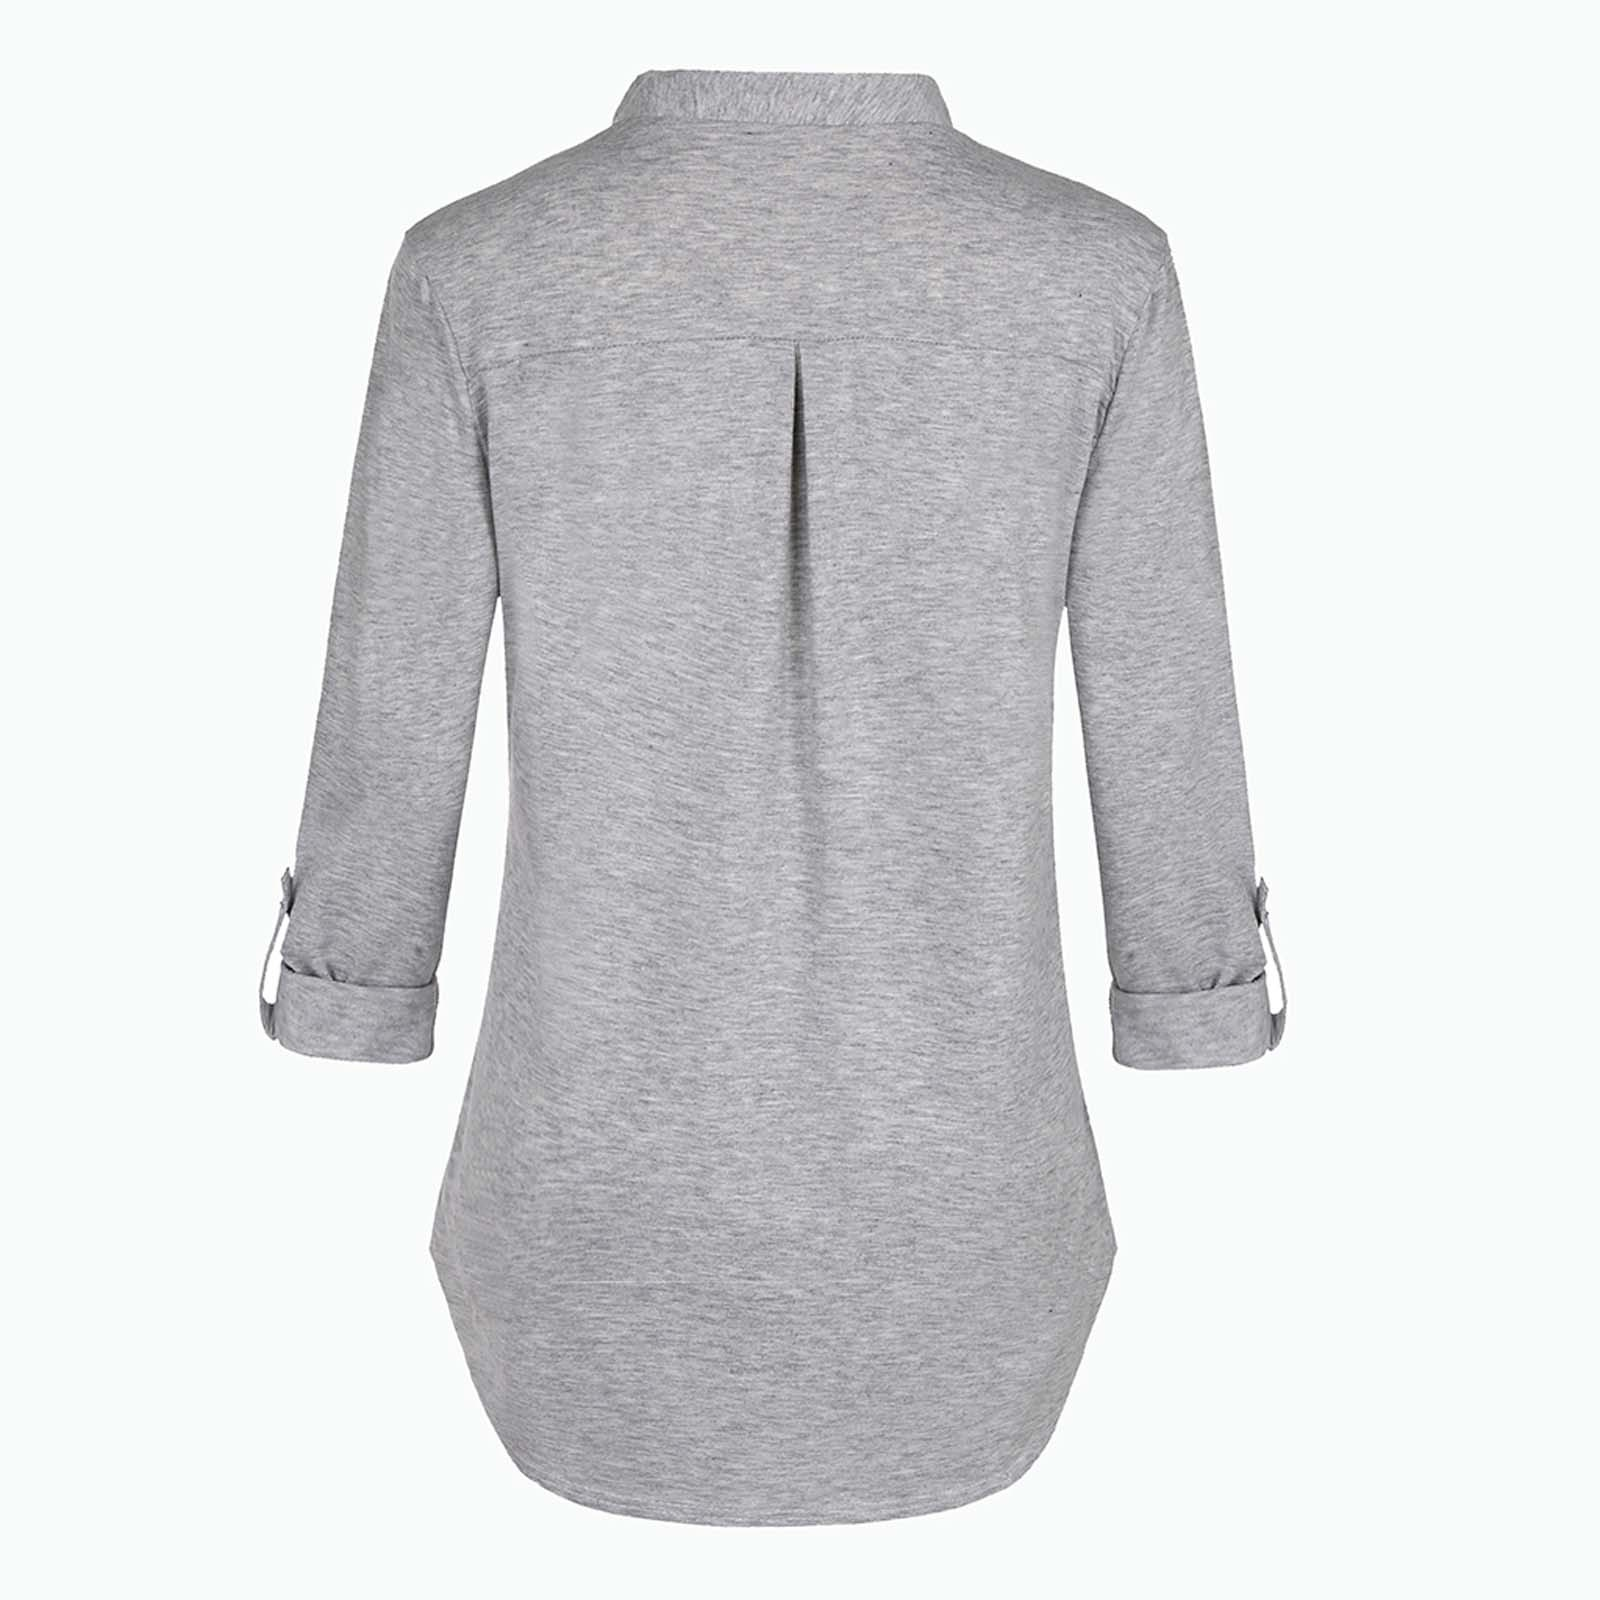 Nova camisa de maternidade, roupa de cor